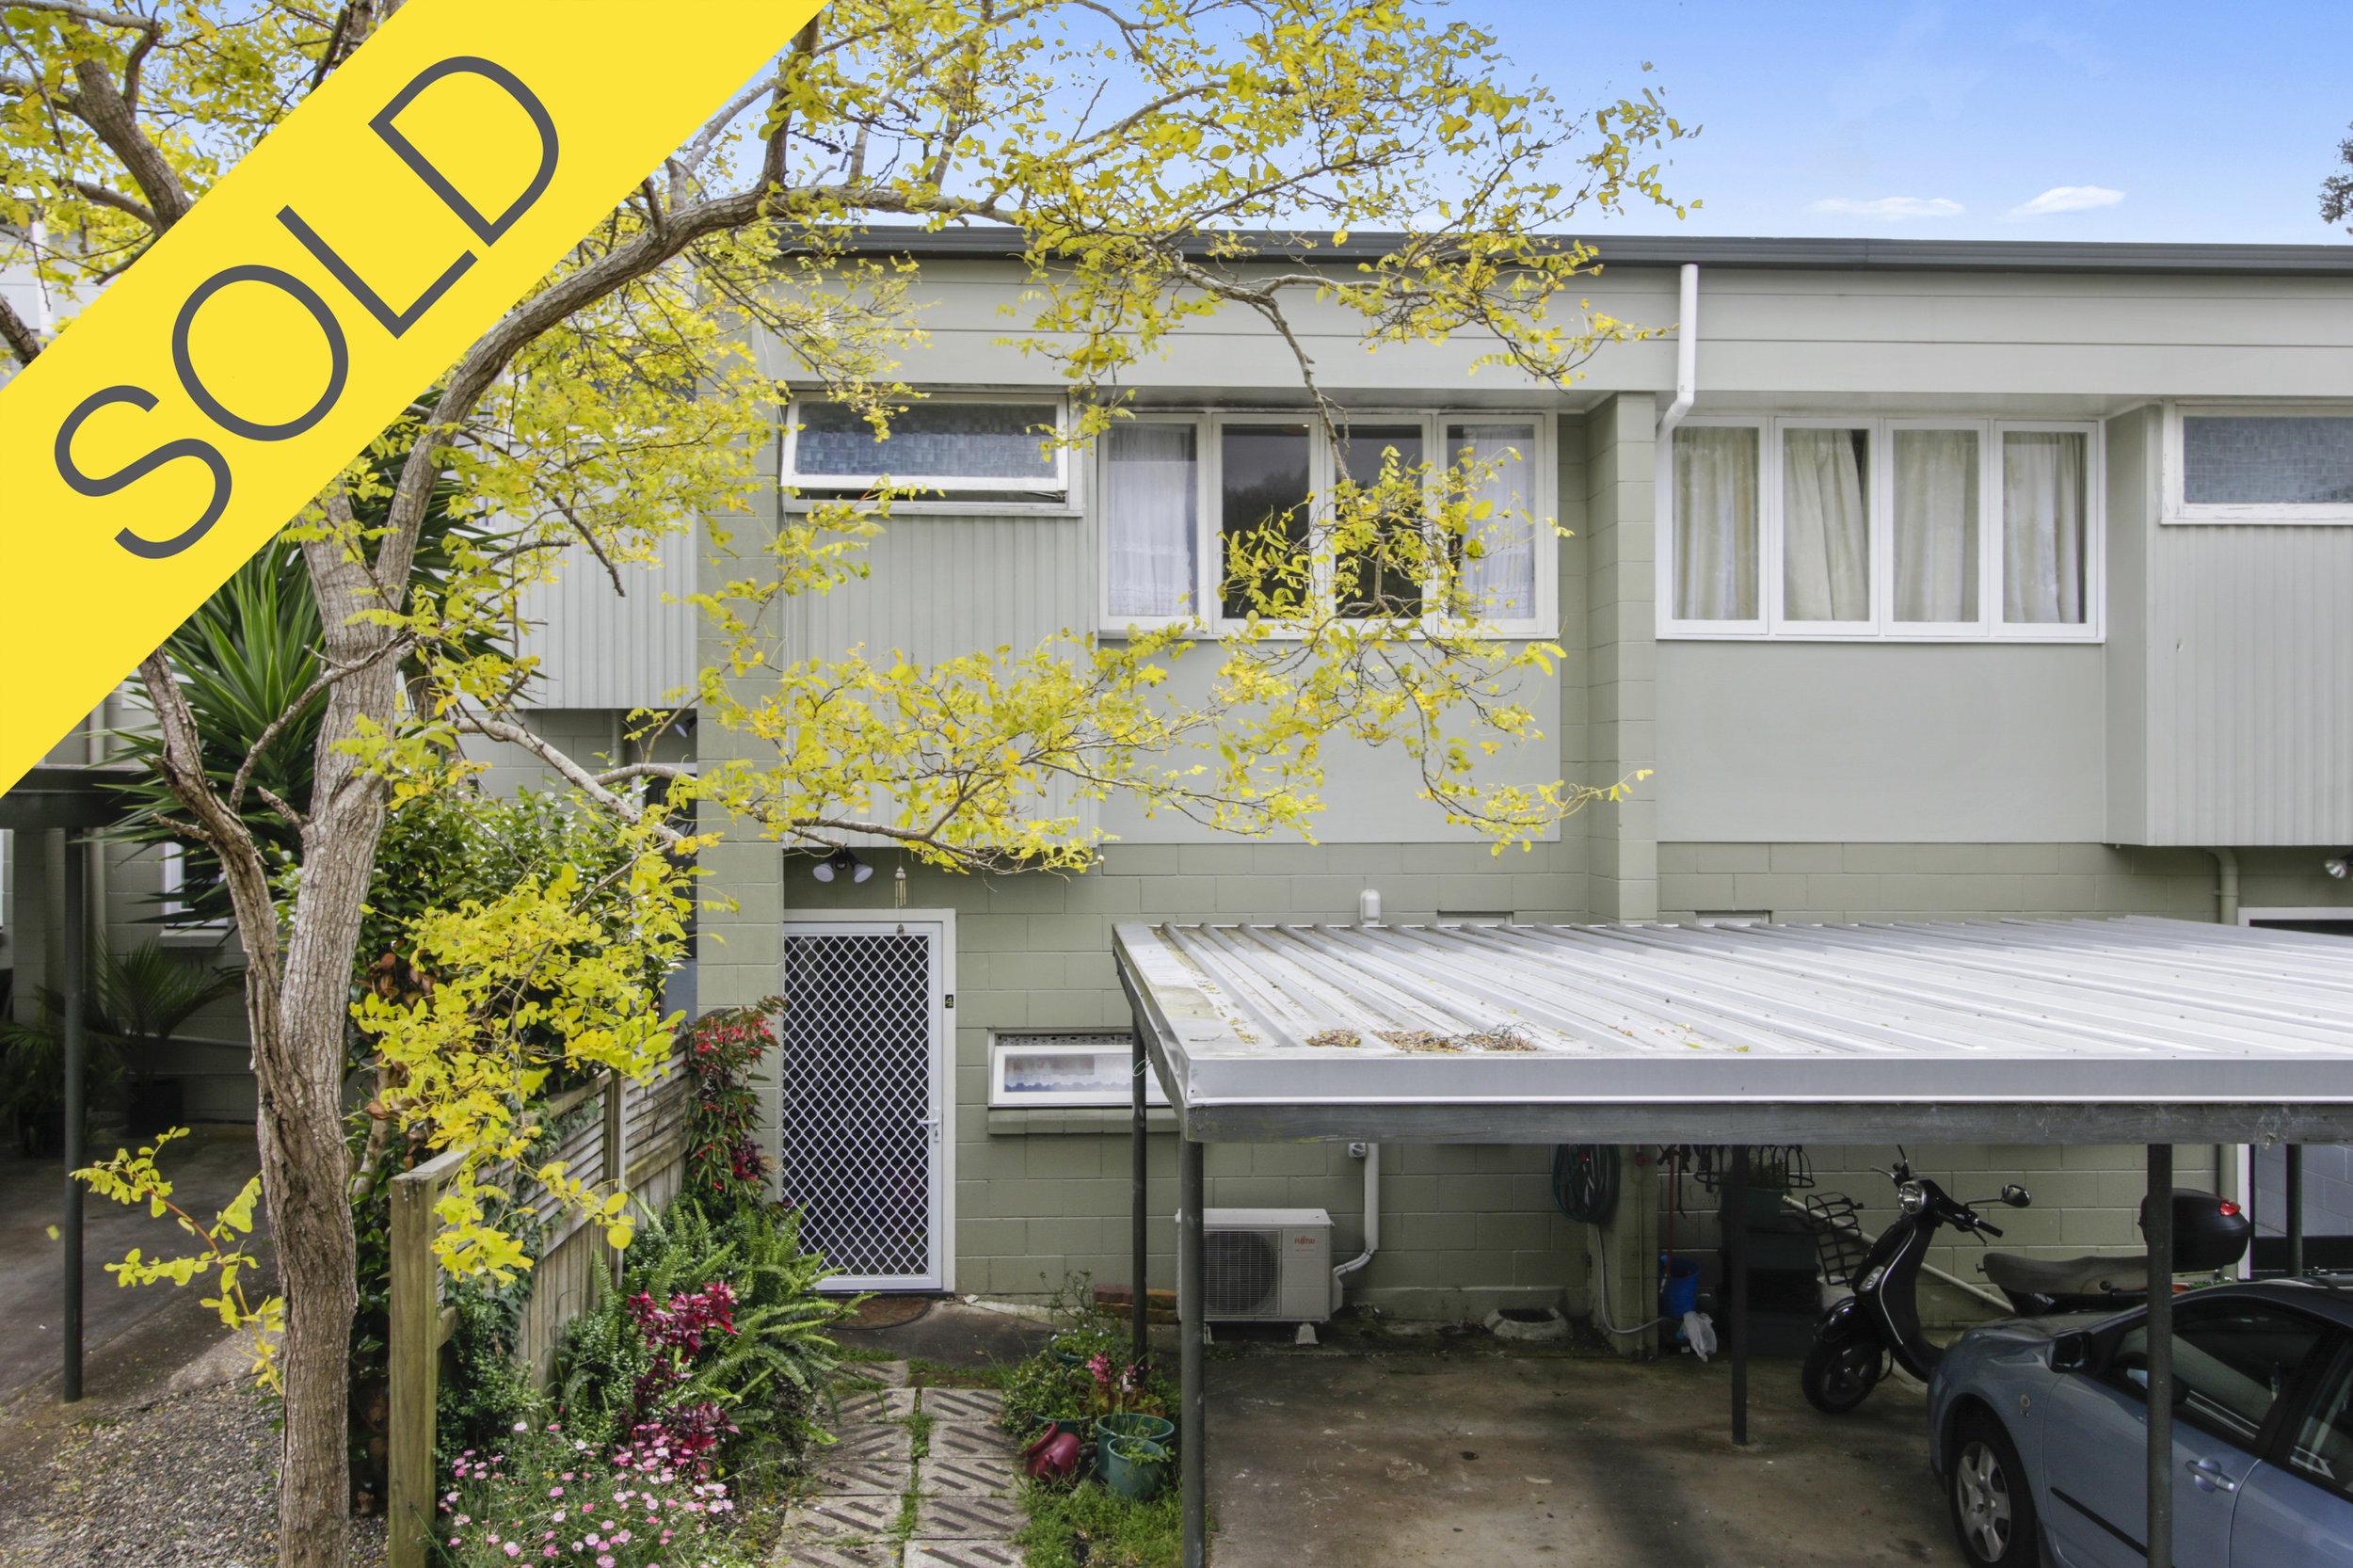 4/41A Mariri Road, Onehunga, Auckland - SOLD JANUARY 20182 Beds | 1 Bath | 1 Parking